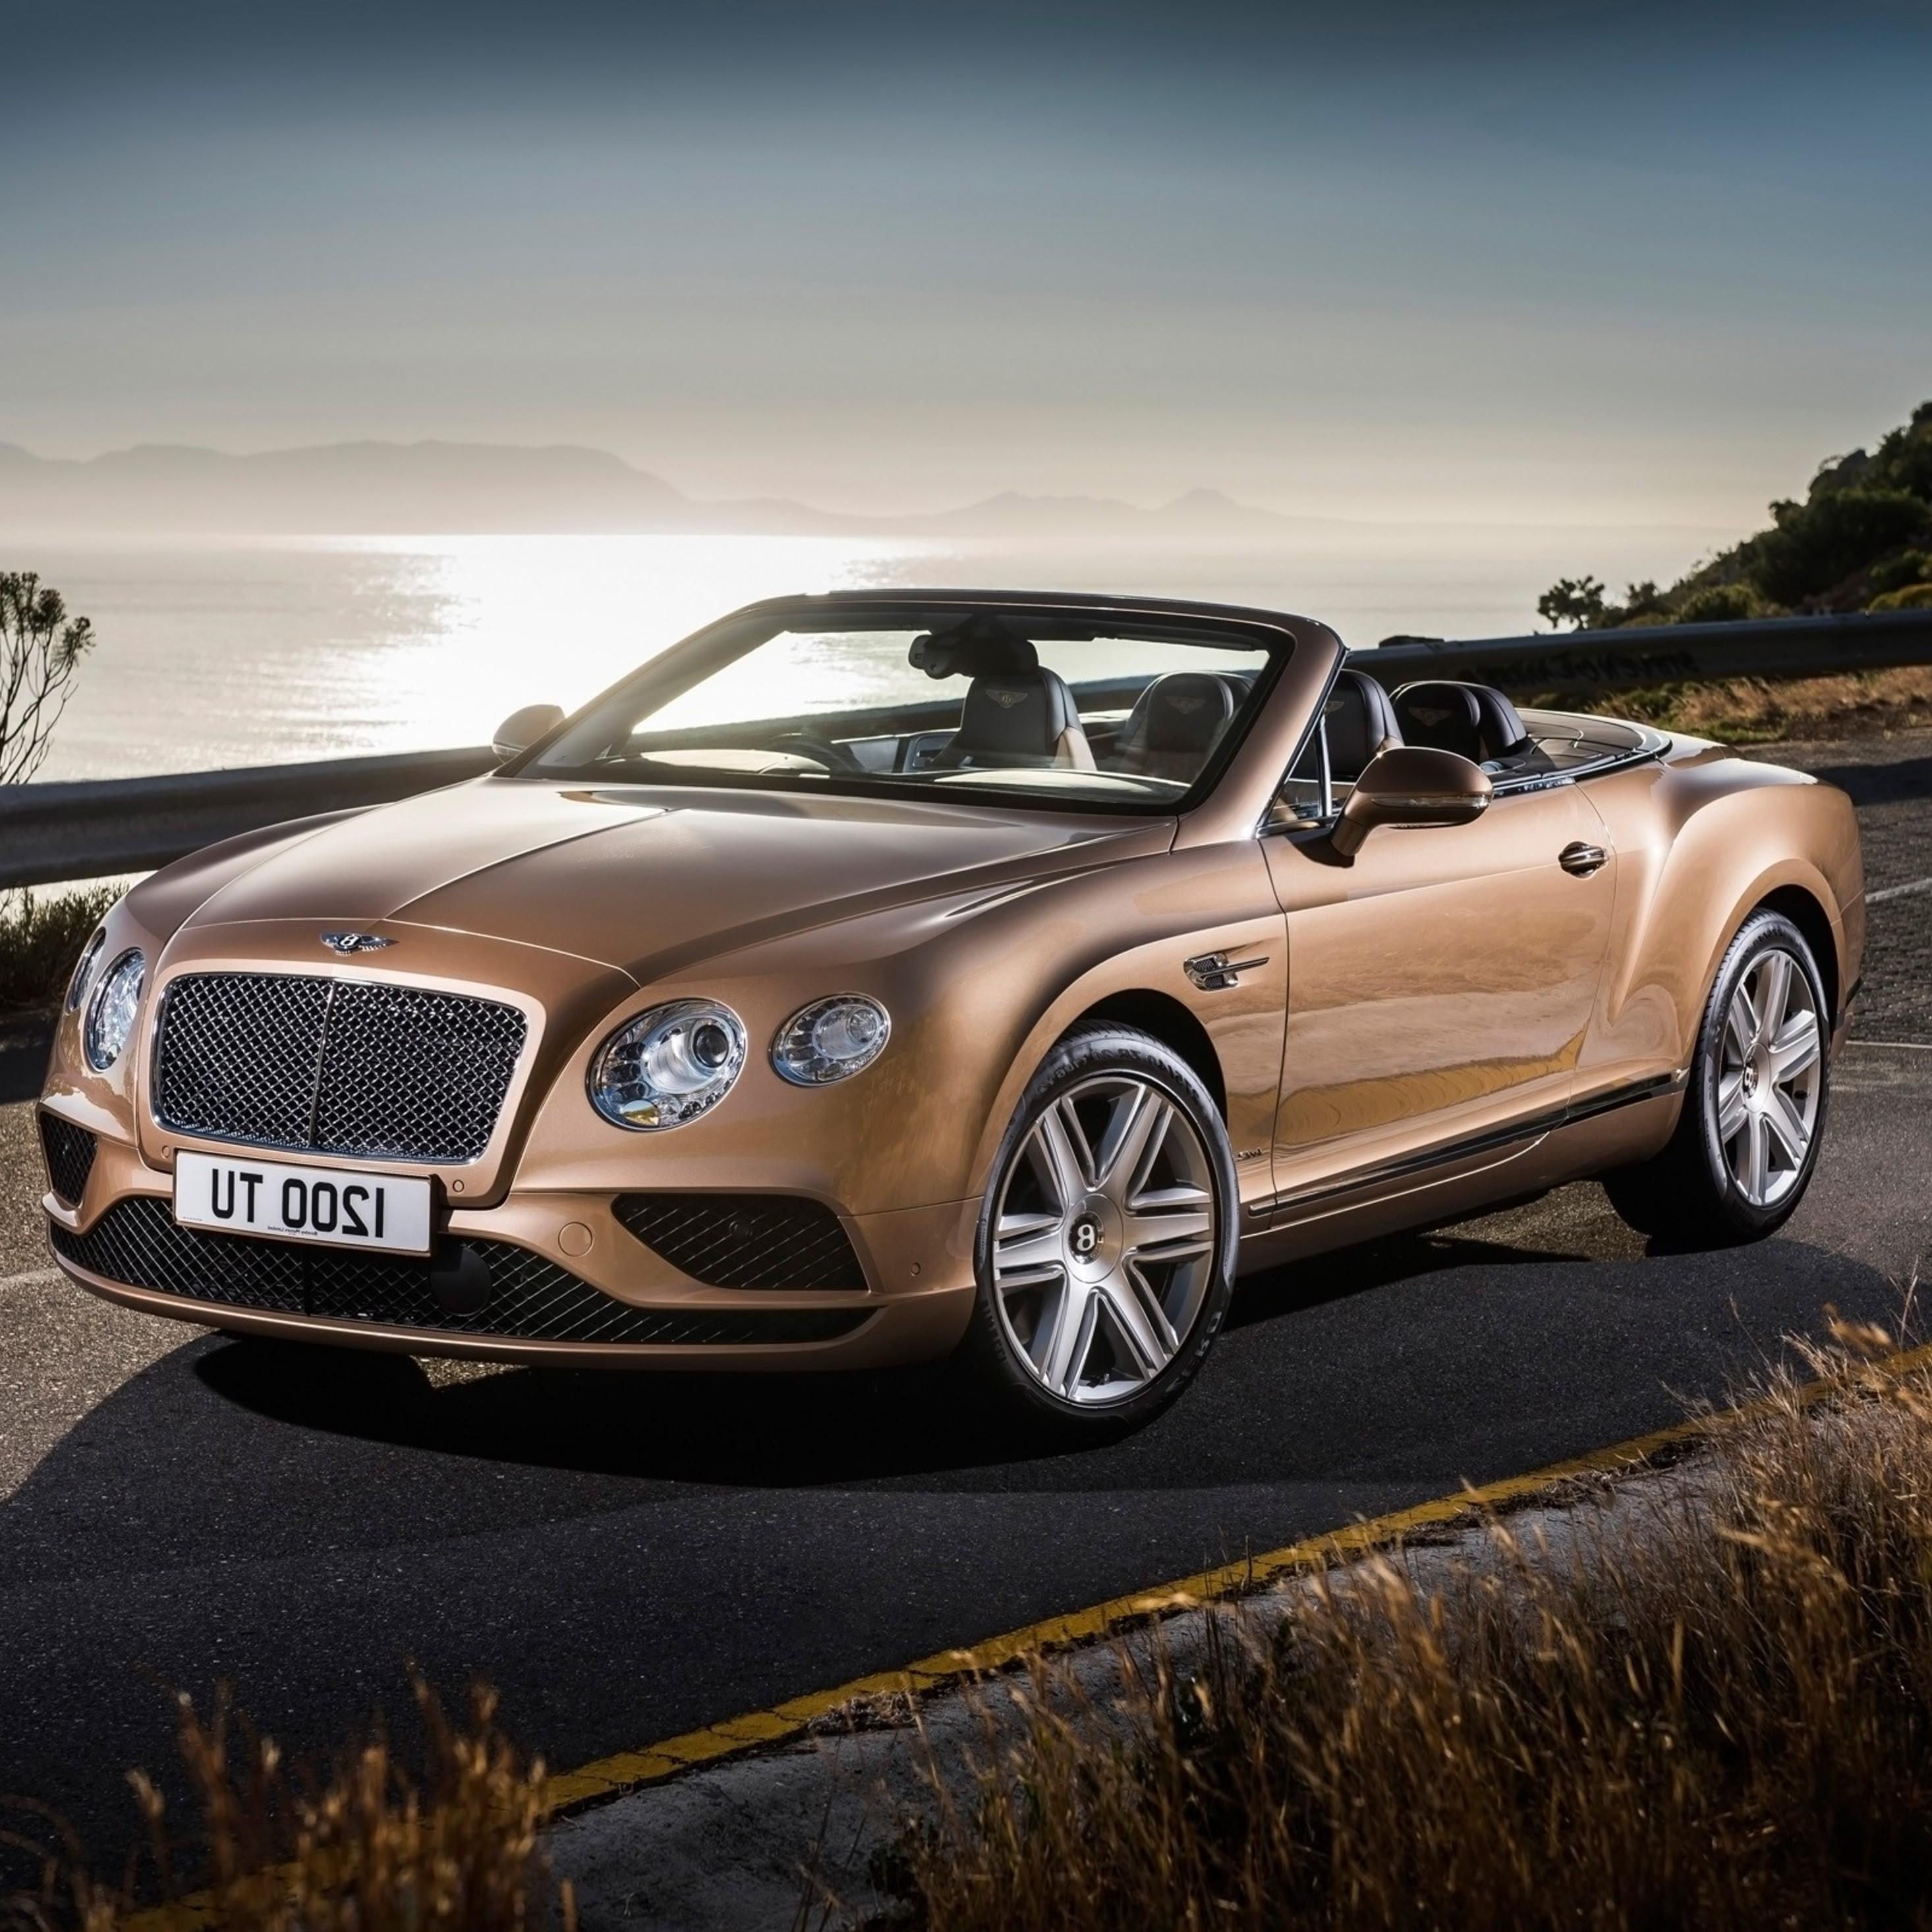 Bentley Continental GT Convertible Wallpapers